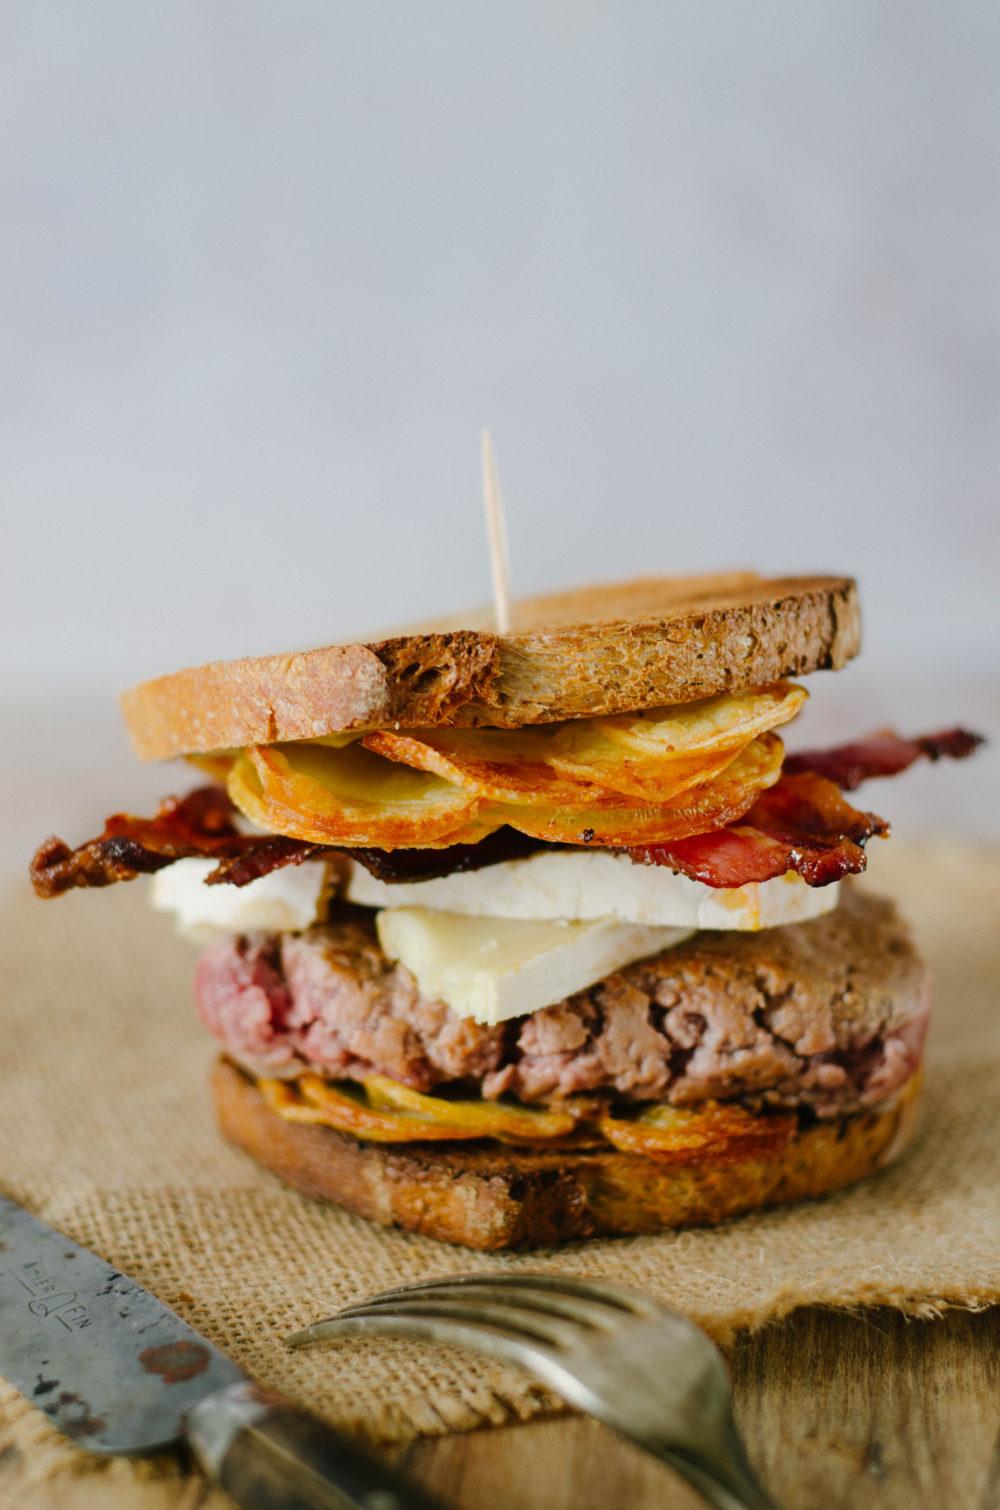 Sandwich reblochon et lard